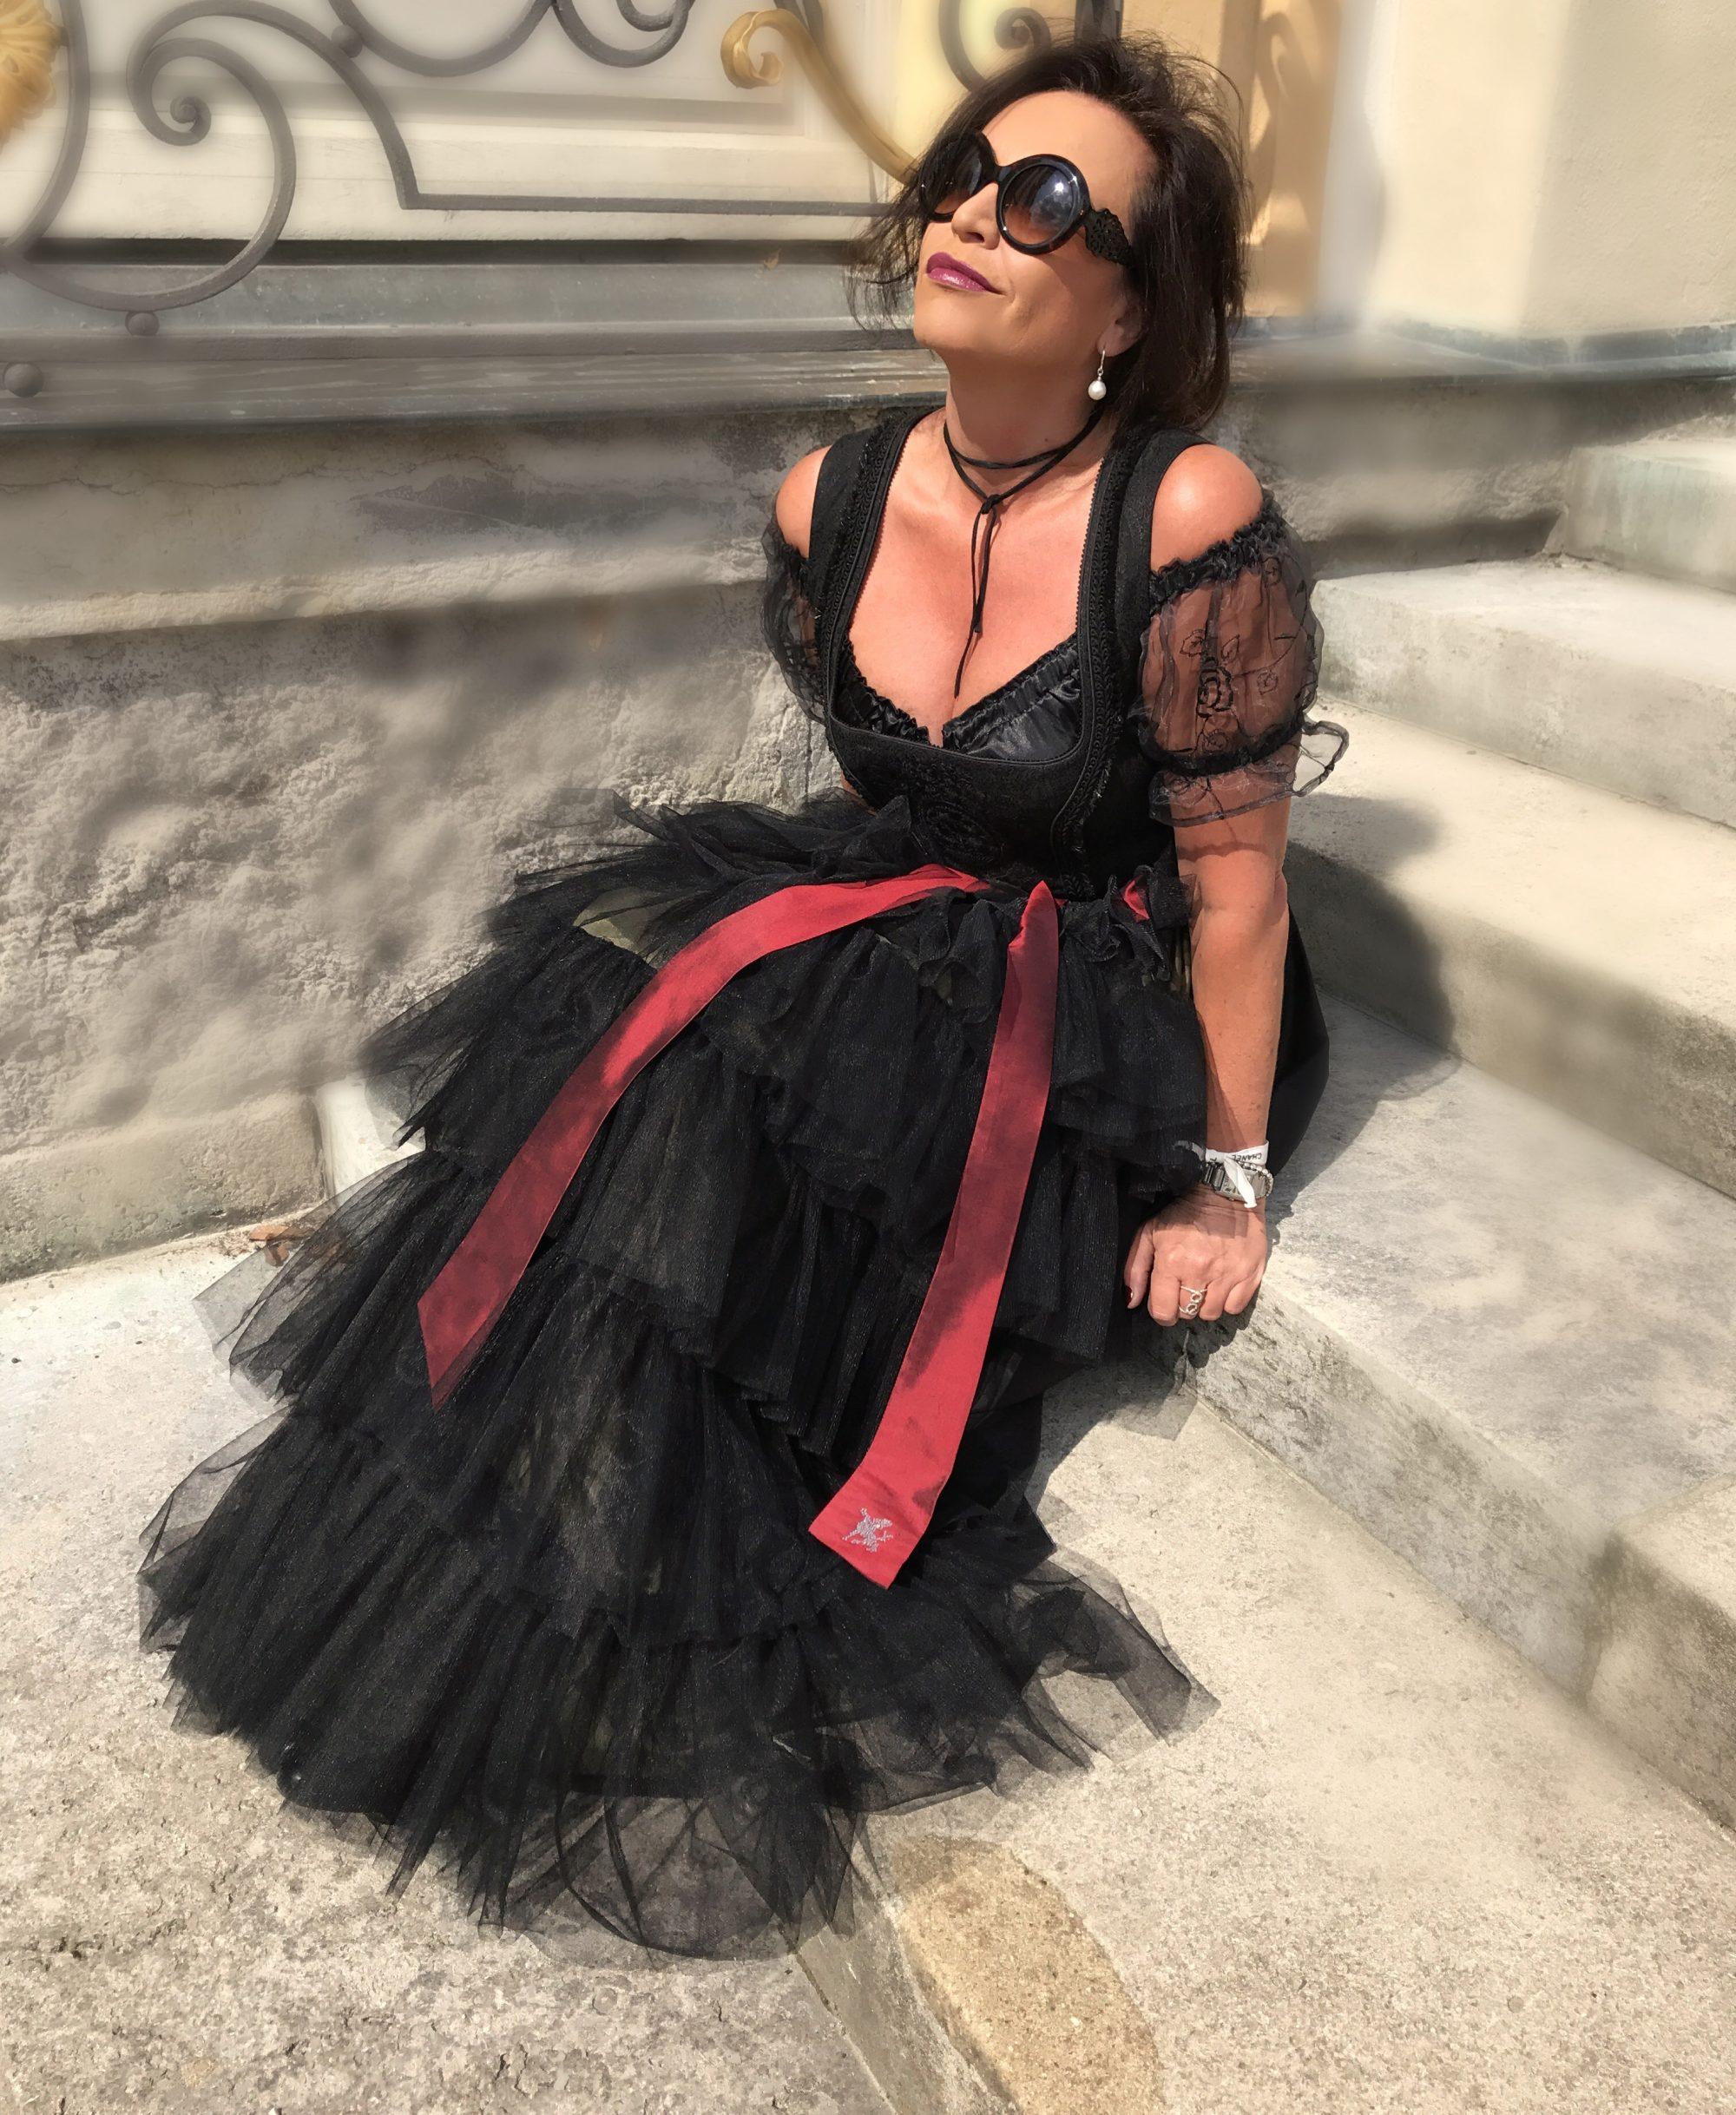 Sportalm Dirndl, Tull, silk, Tracht, Oktoberfest, Glamour, Angermaier, influencer50+, Bekleidung, Damenmode, bestage, ageless style